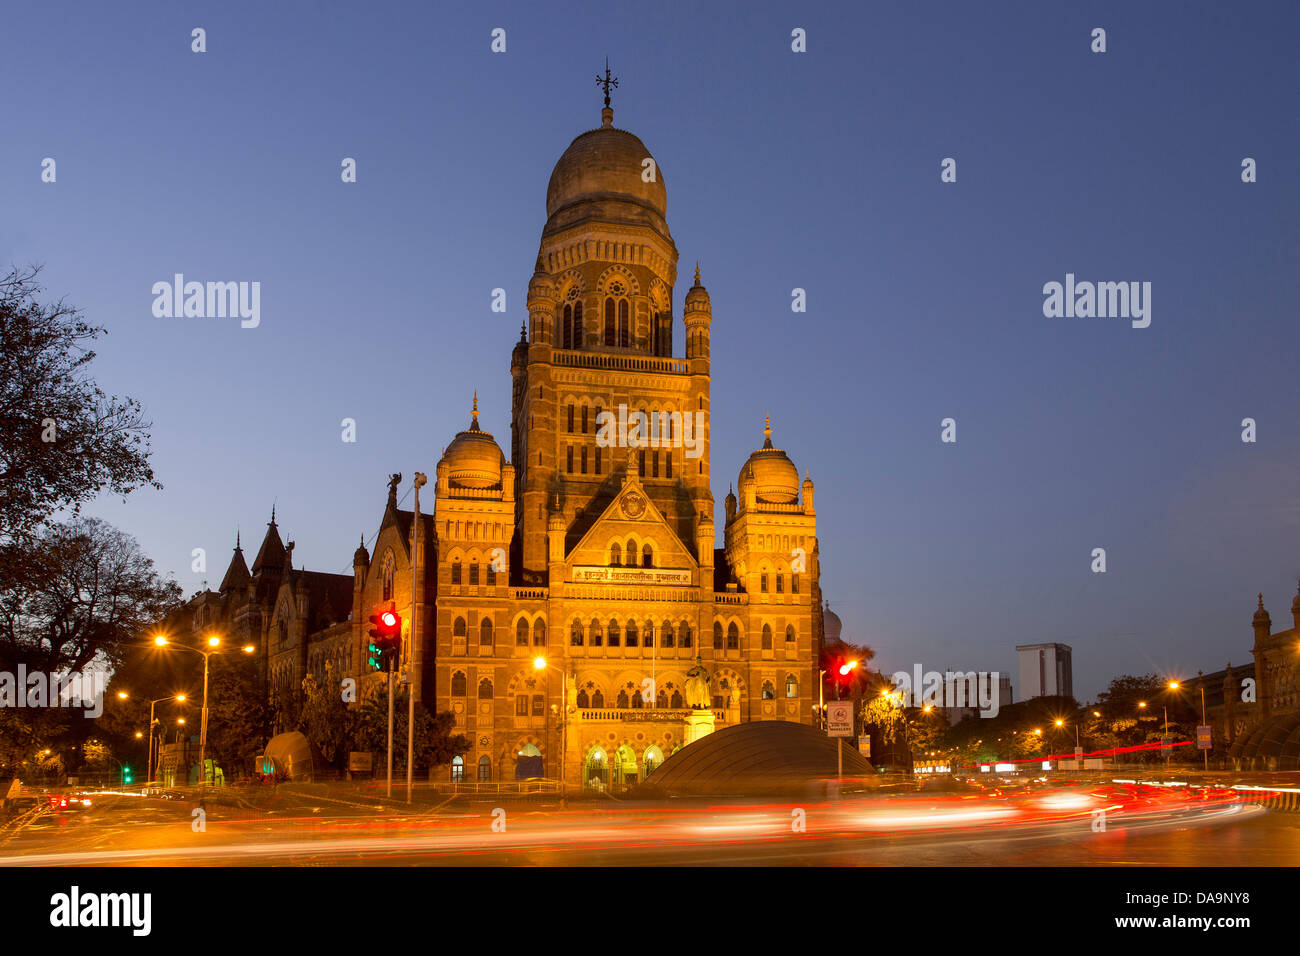 L'Inde, l'Inde, Asie, Maharashtra, Mumbai, Bombay, Ville, Dadabhai Naoroji Road, Corporation municipale, Photo Stock